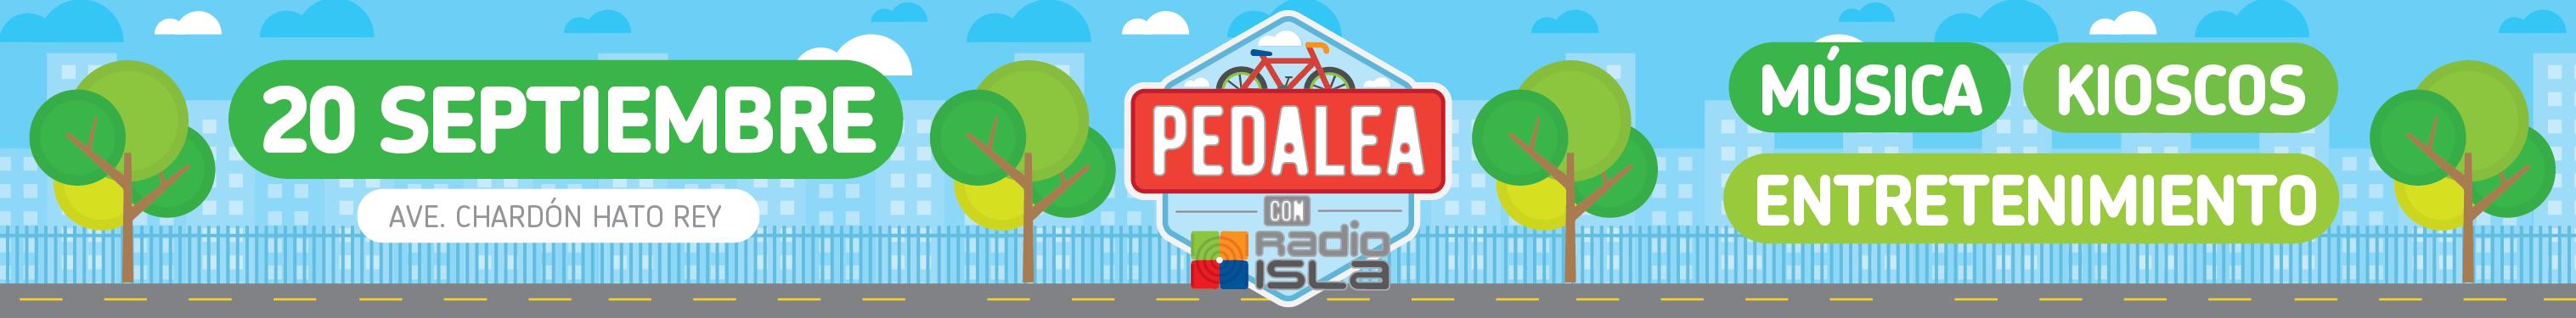 Webbanner 728x90 - Pedalea con Radio Isla-02